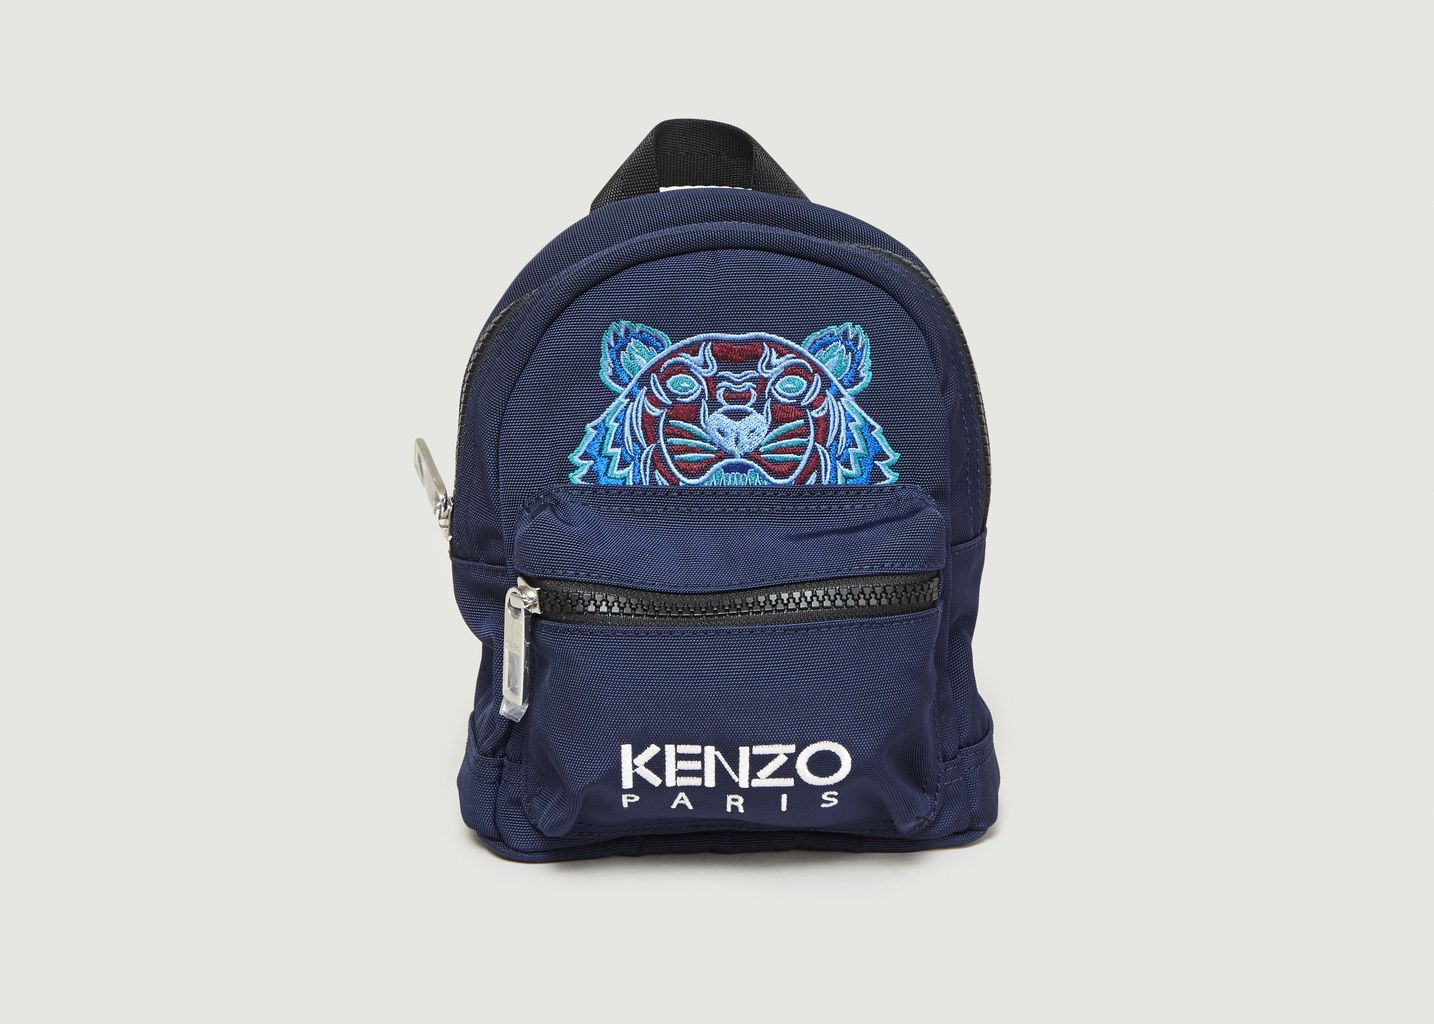 Mini Sac à Dos Tigre - Kenzo